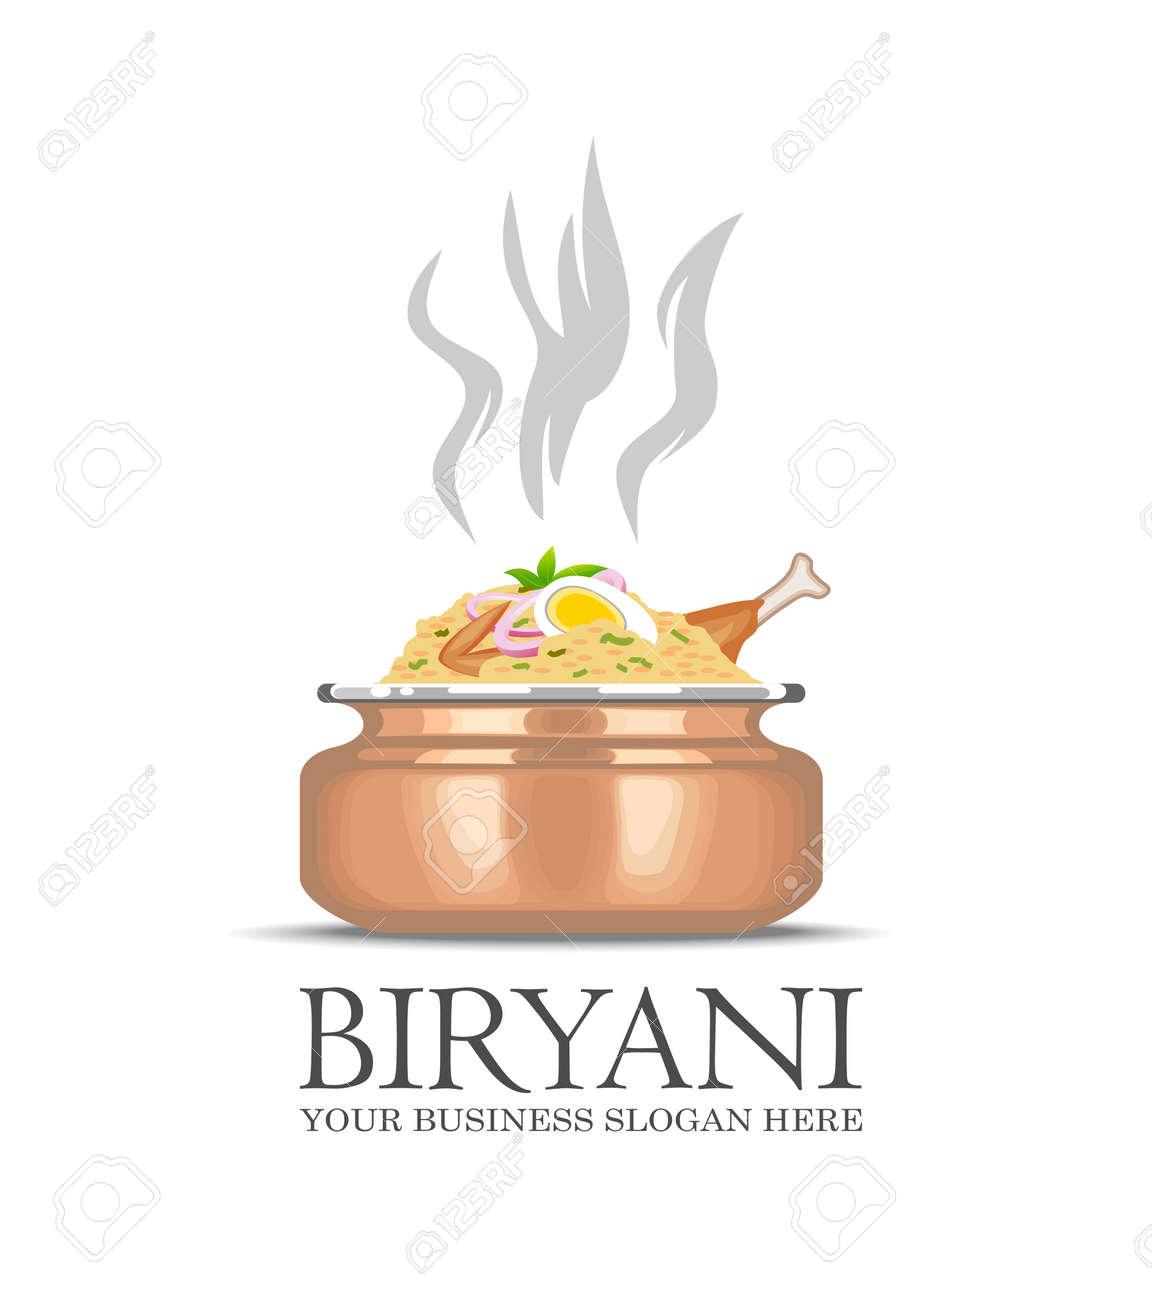 An illustration of famous indian dish Biryani icon - 79725891